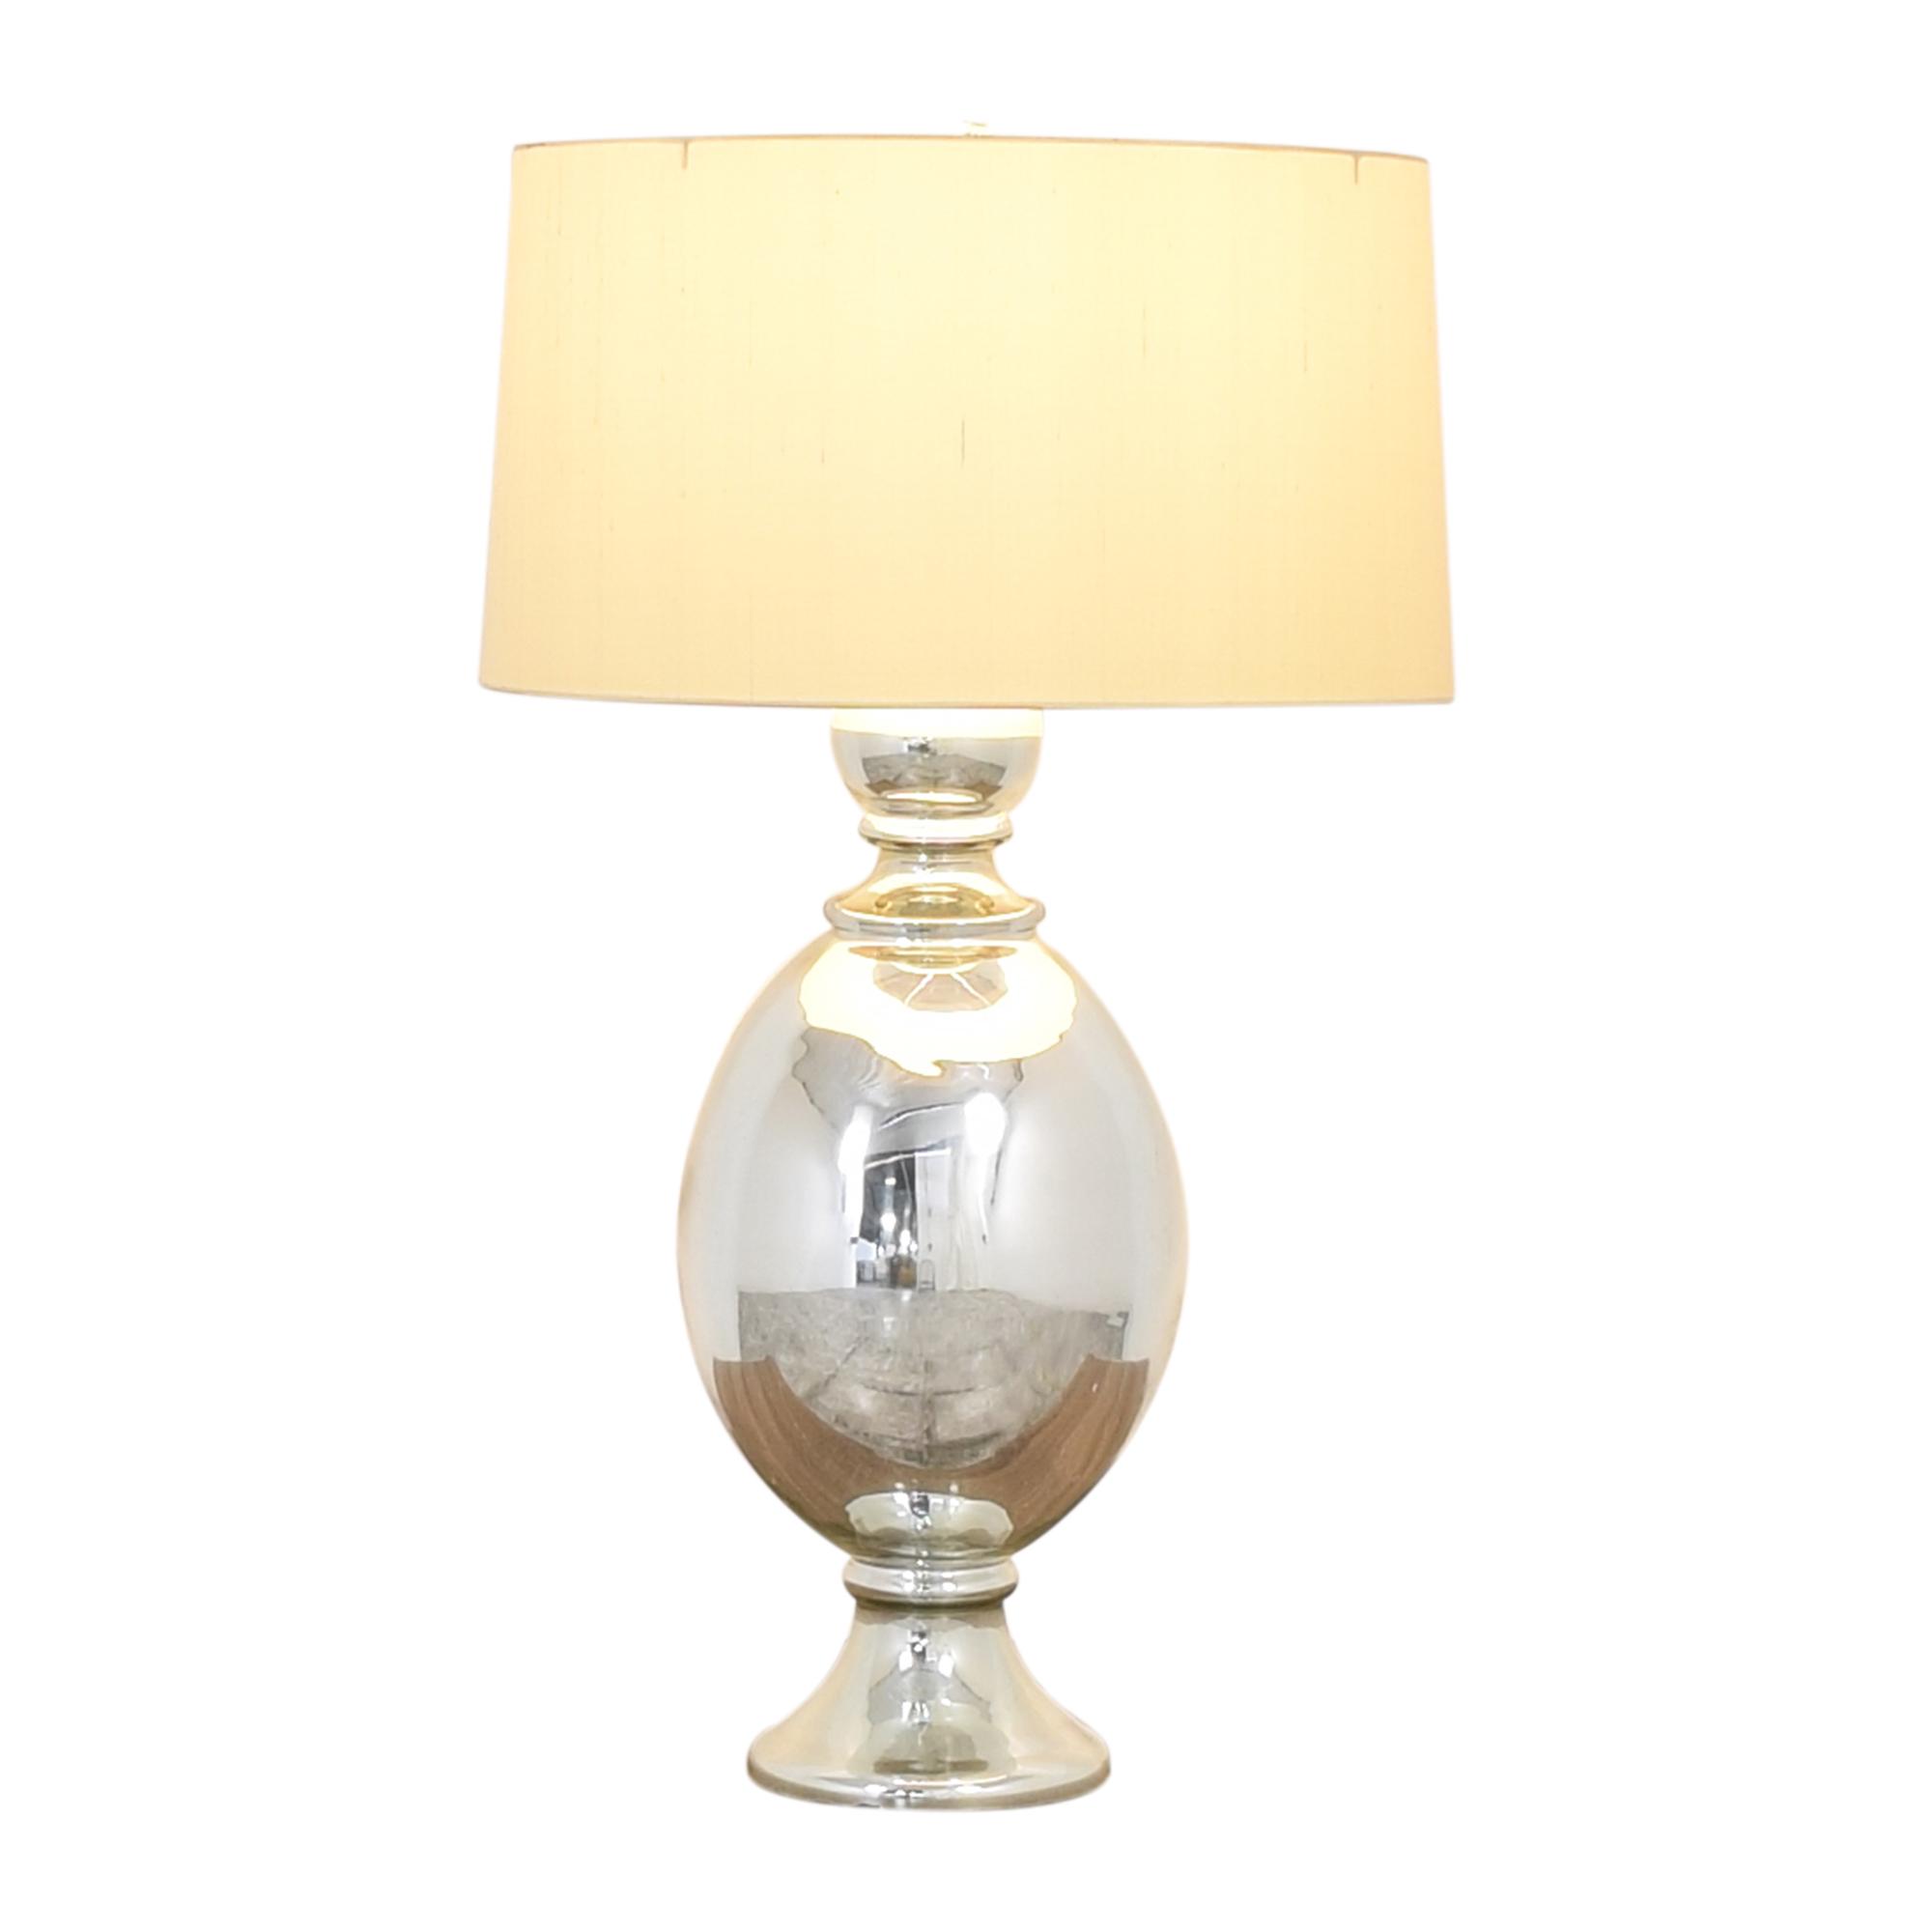 ABC Carpet & Home Decorative Table Lamp price